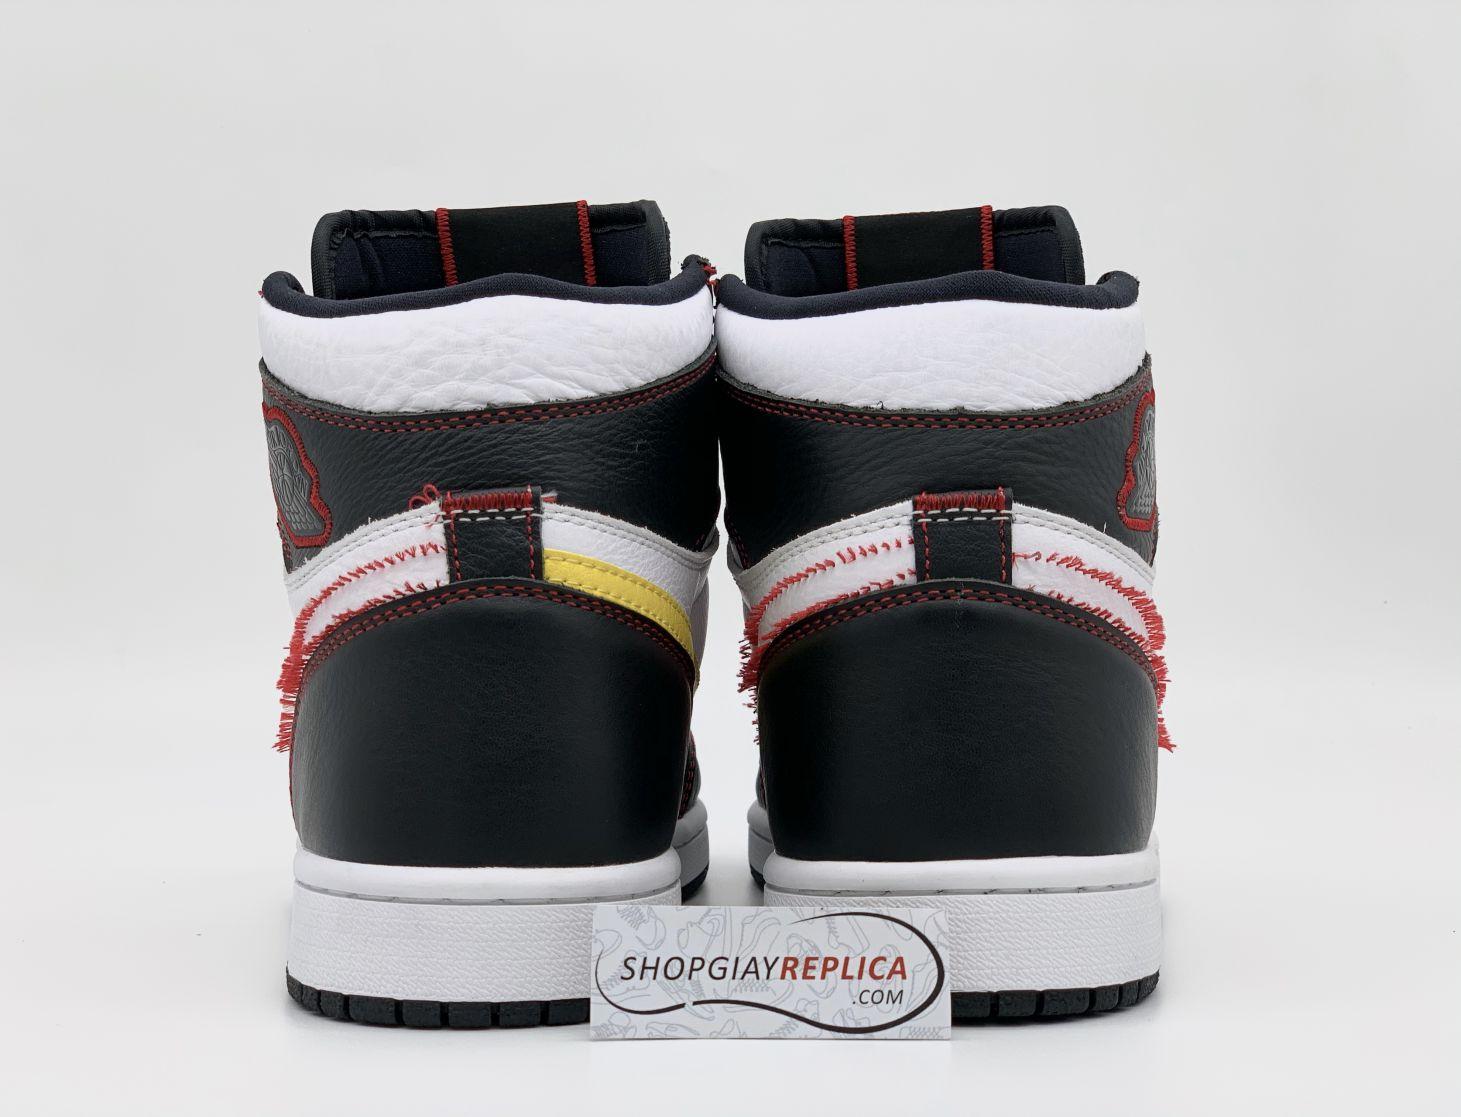 Nike Air Jordan 1 Retro High Defiant White Black Gym Red